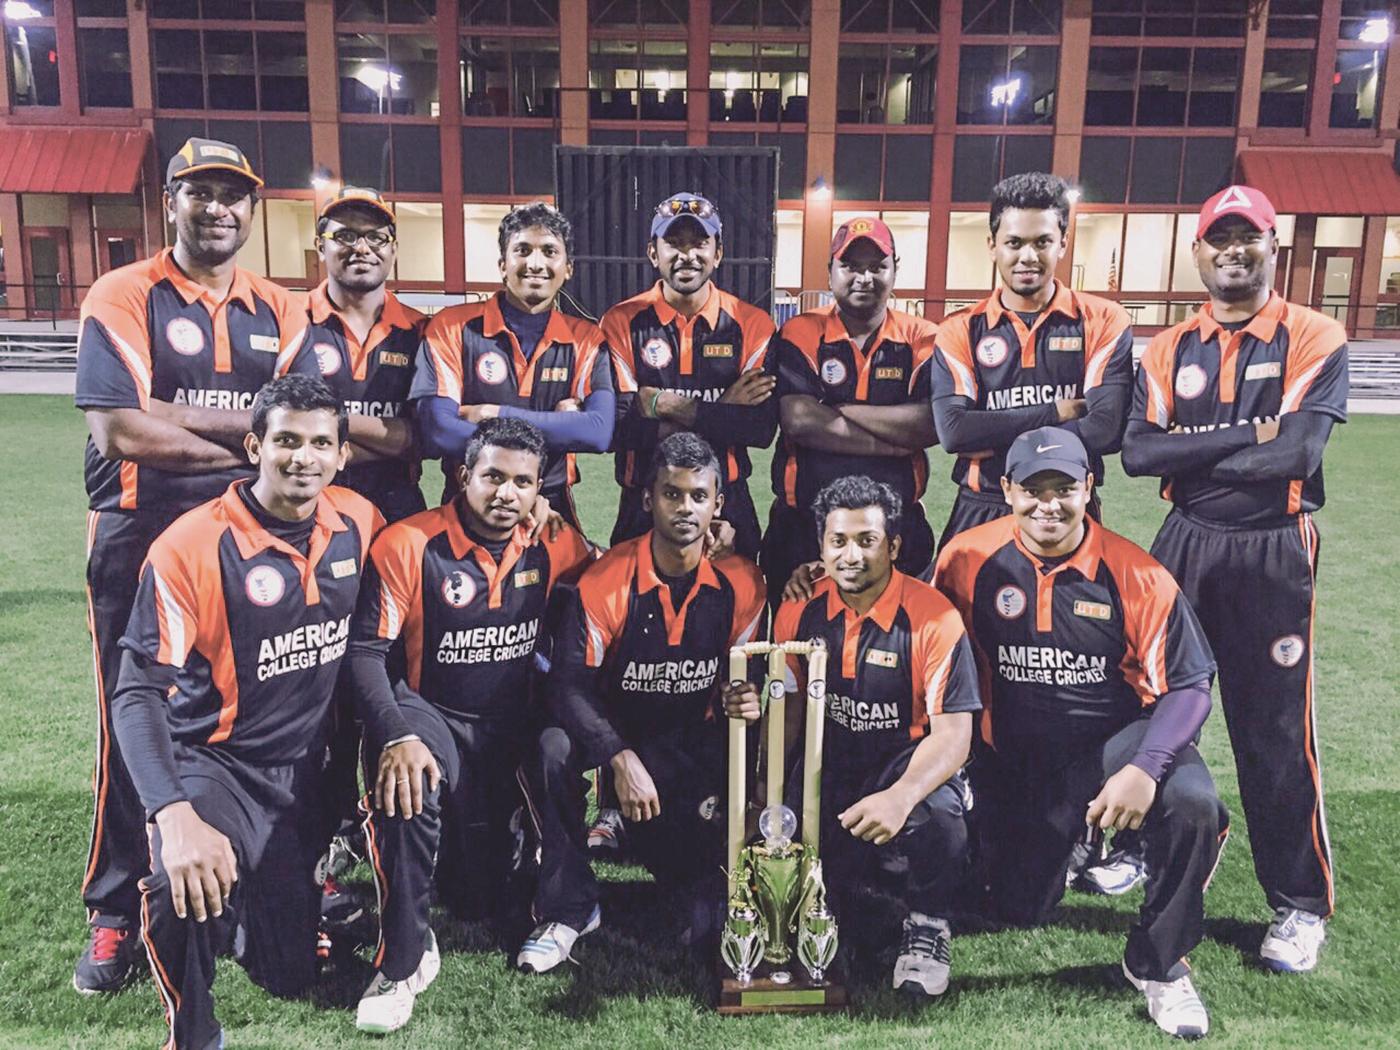 Cricket team wins nat'l tourney, plans to expand